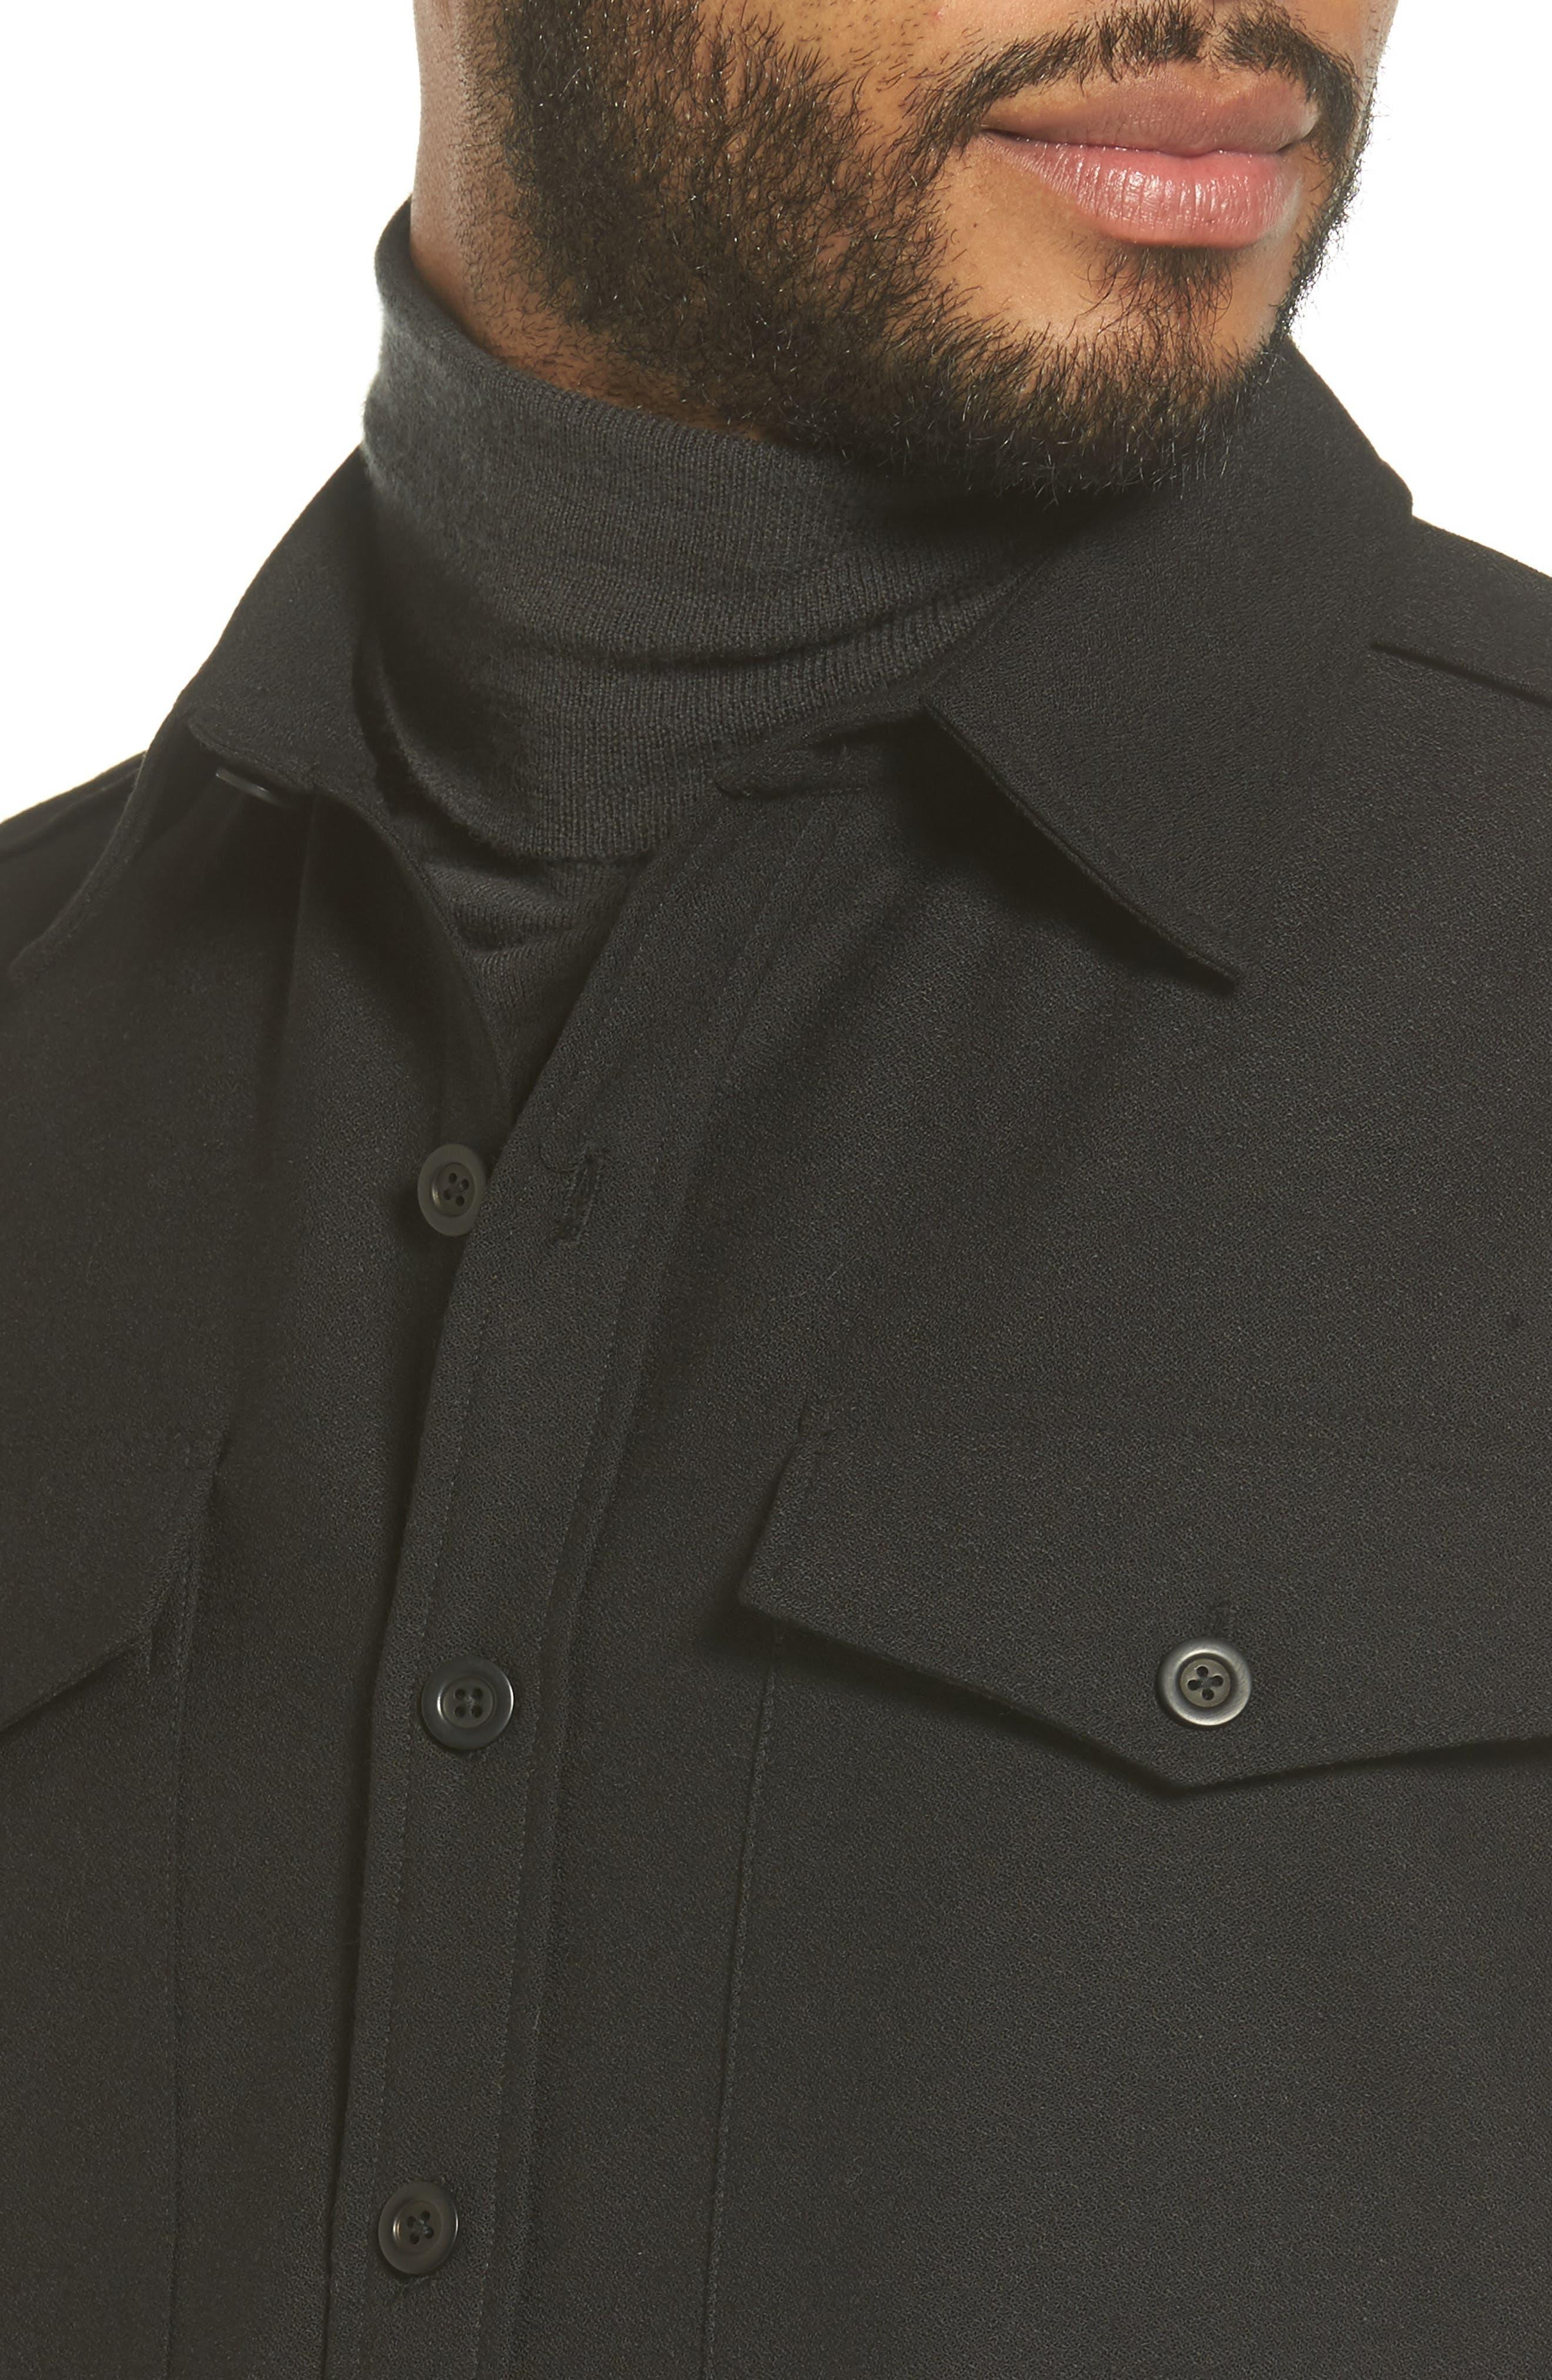 Regular Fit Sport Shirt,                             Alternate thumbnail 4, color,                             Black